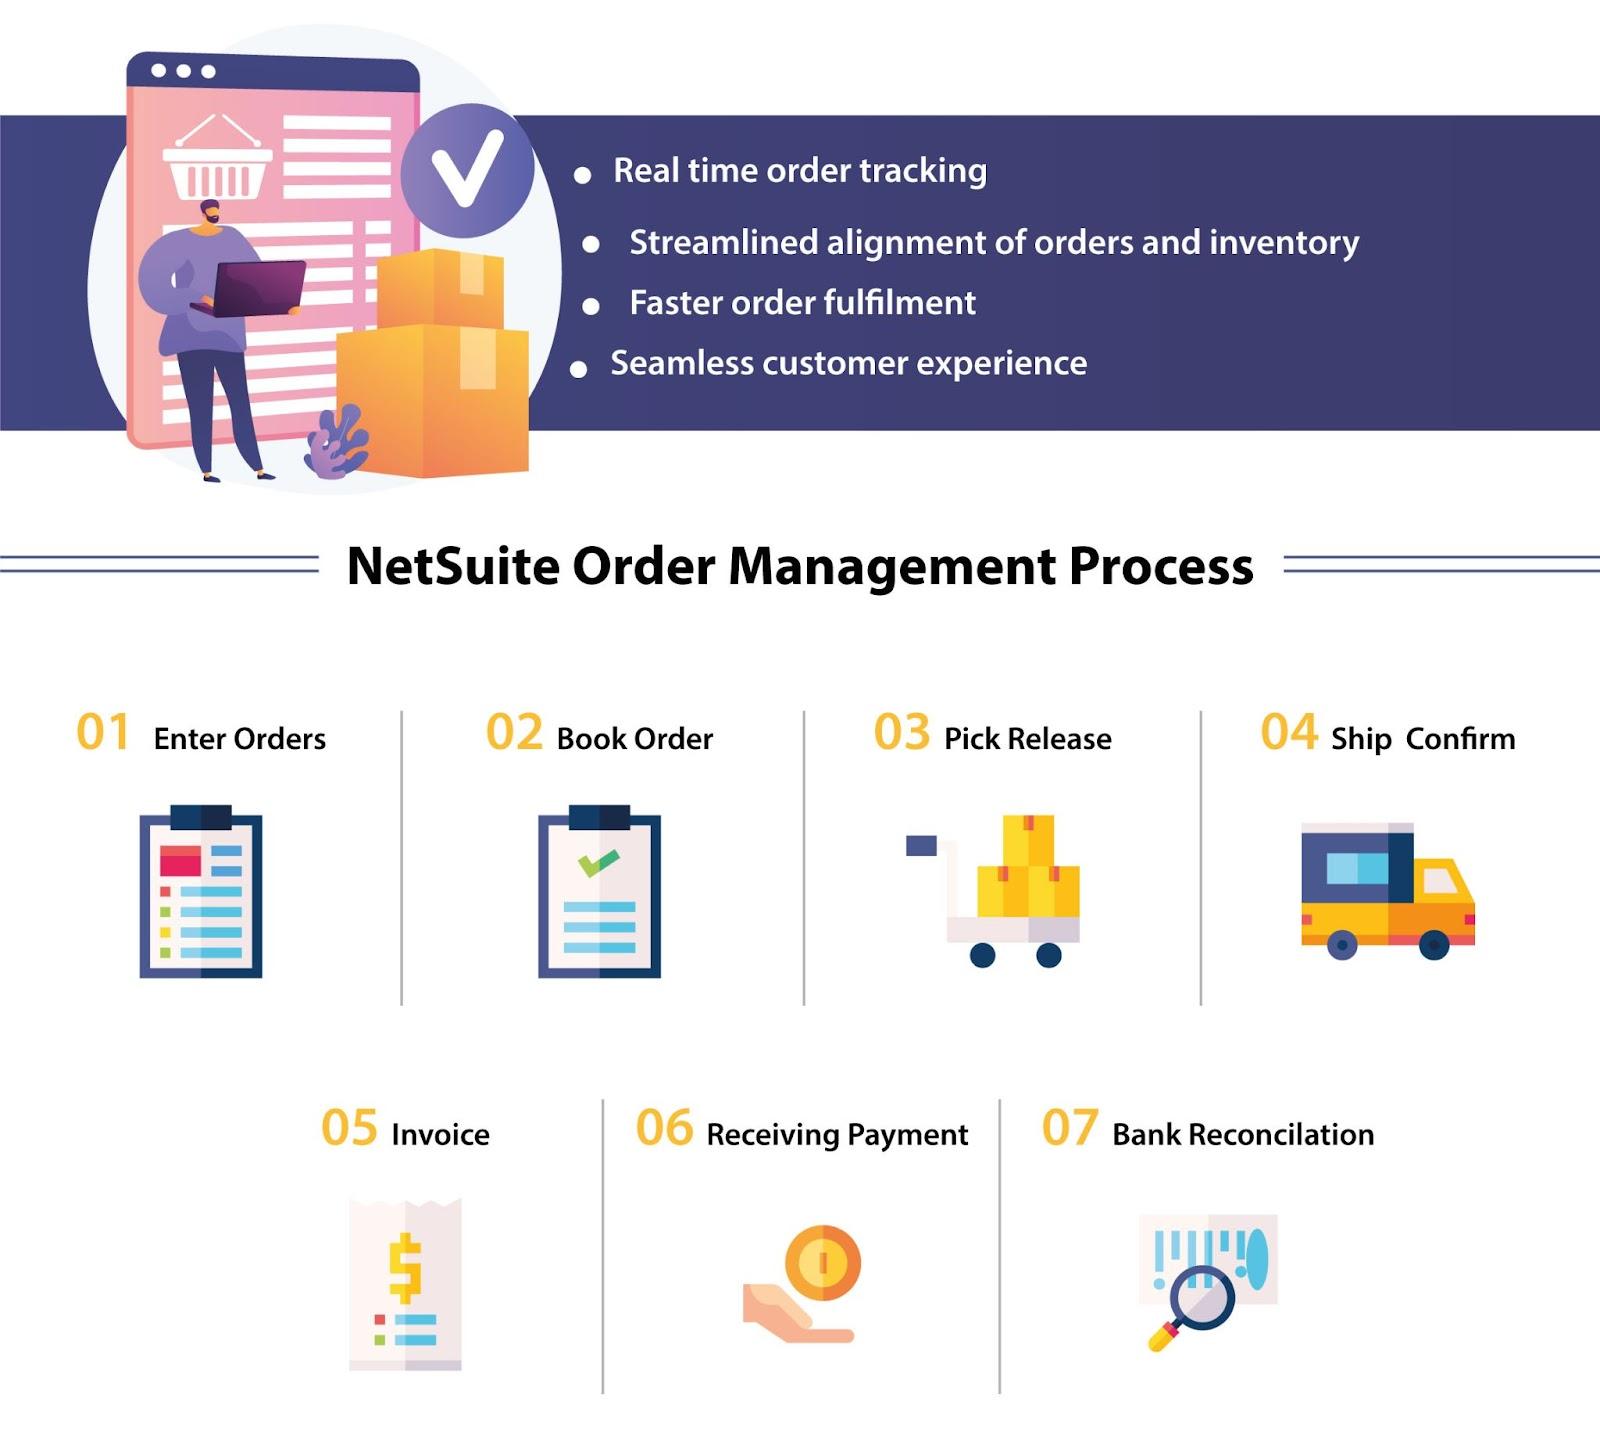 NetSuite order management process